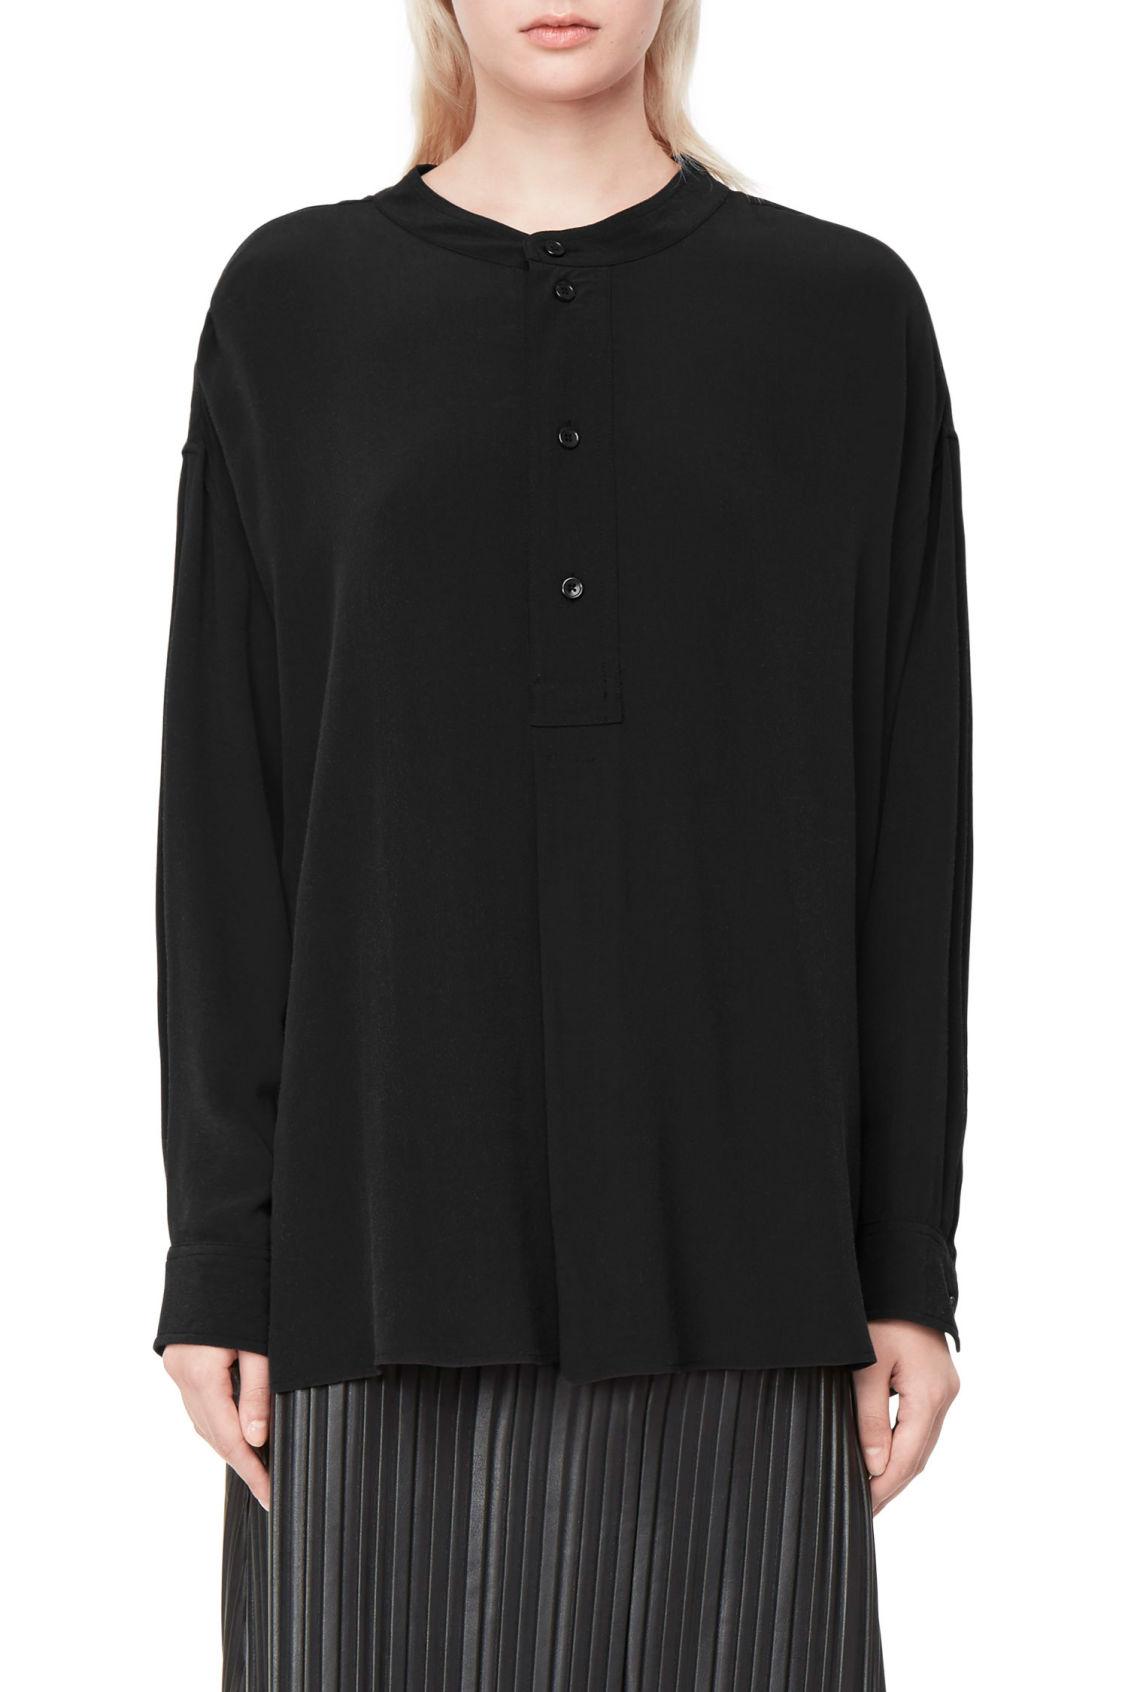 Weekday Giant Shirt - Black Nicekicks Pas Cher En Ligne Commerce À Vendre dIxI8ovgx